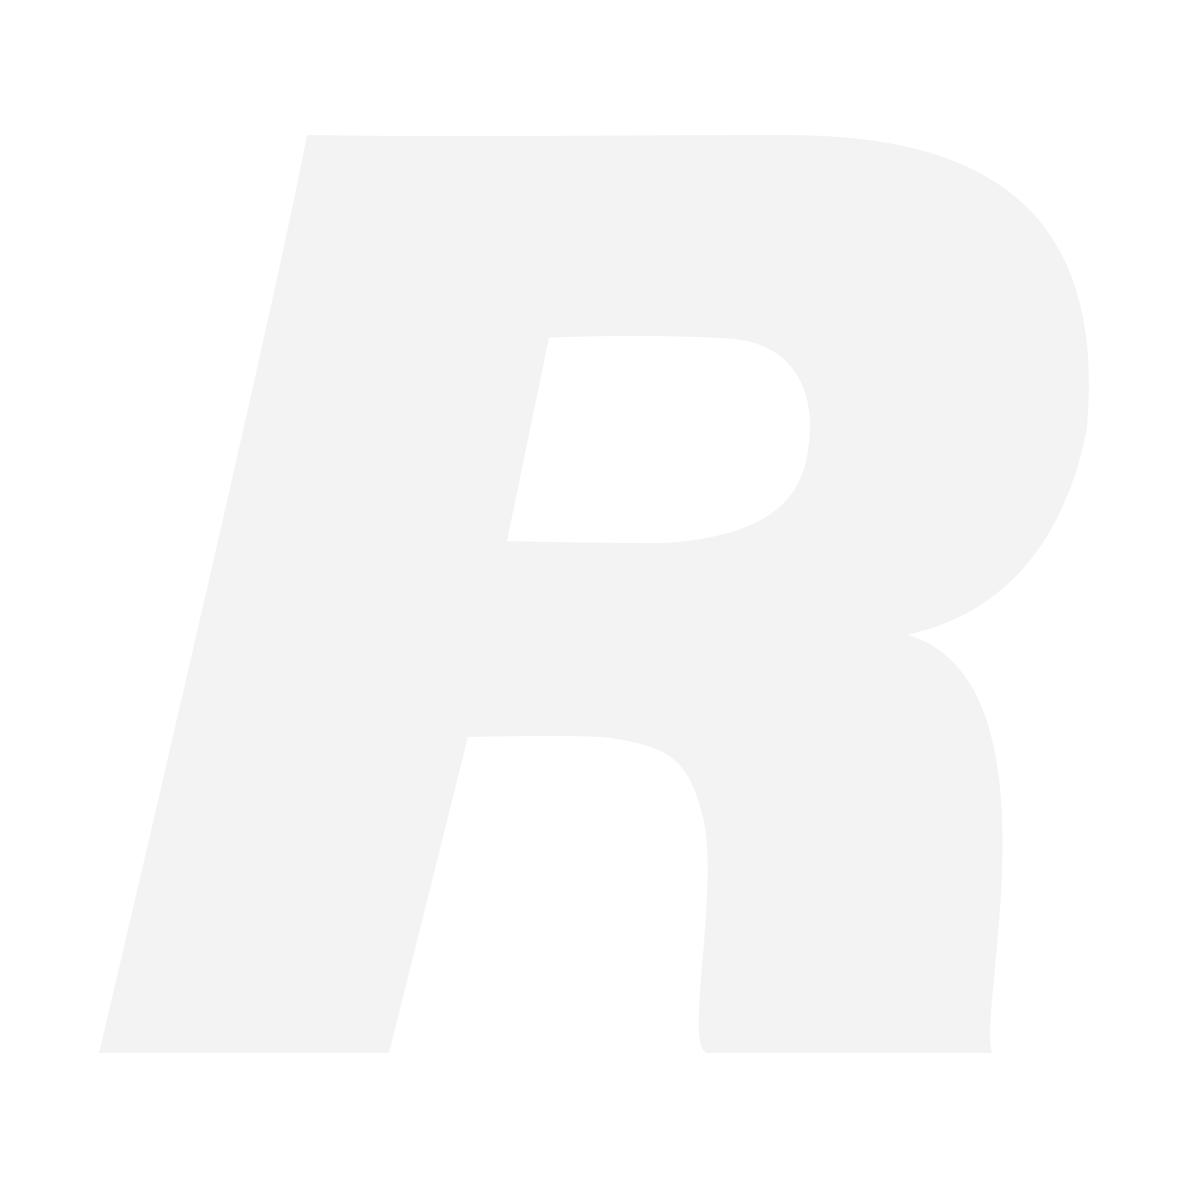 FUJI LENS HOOD 35/2 R WR SIL (+XF 23/2)